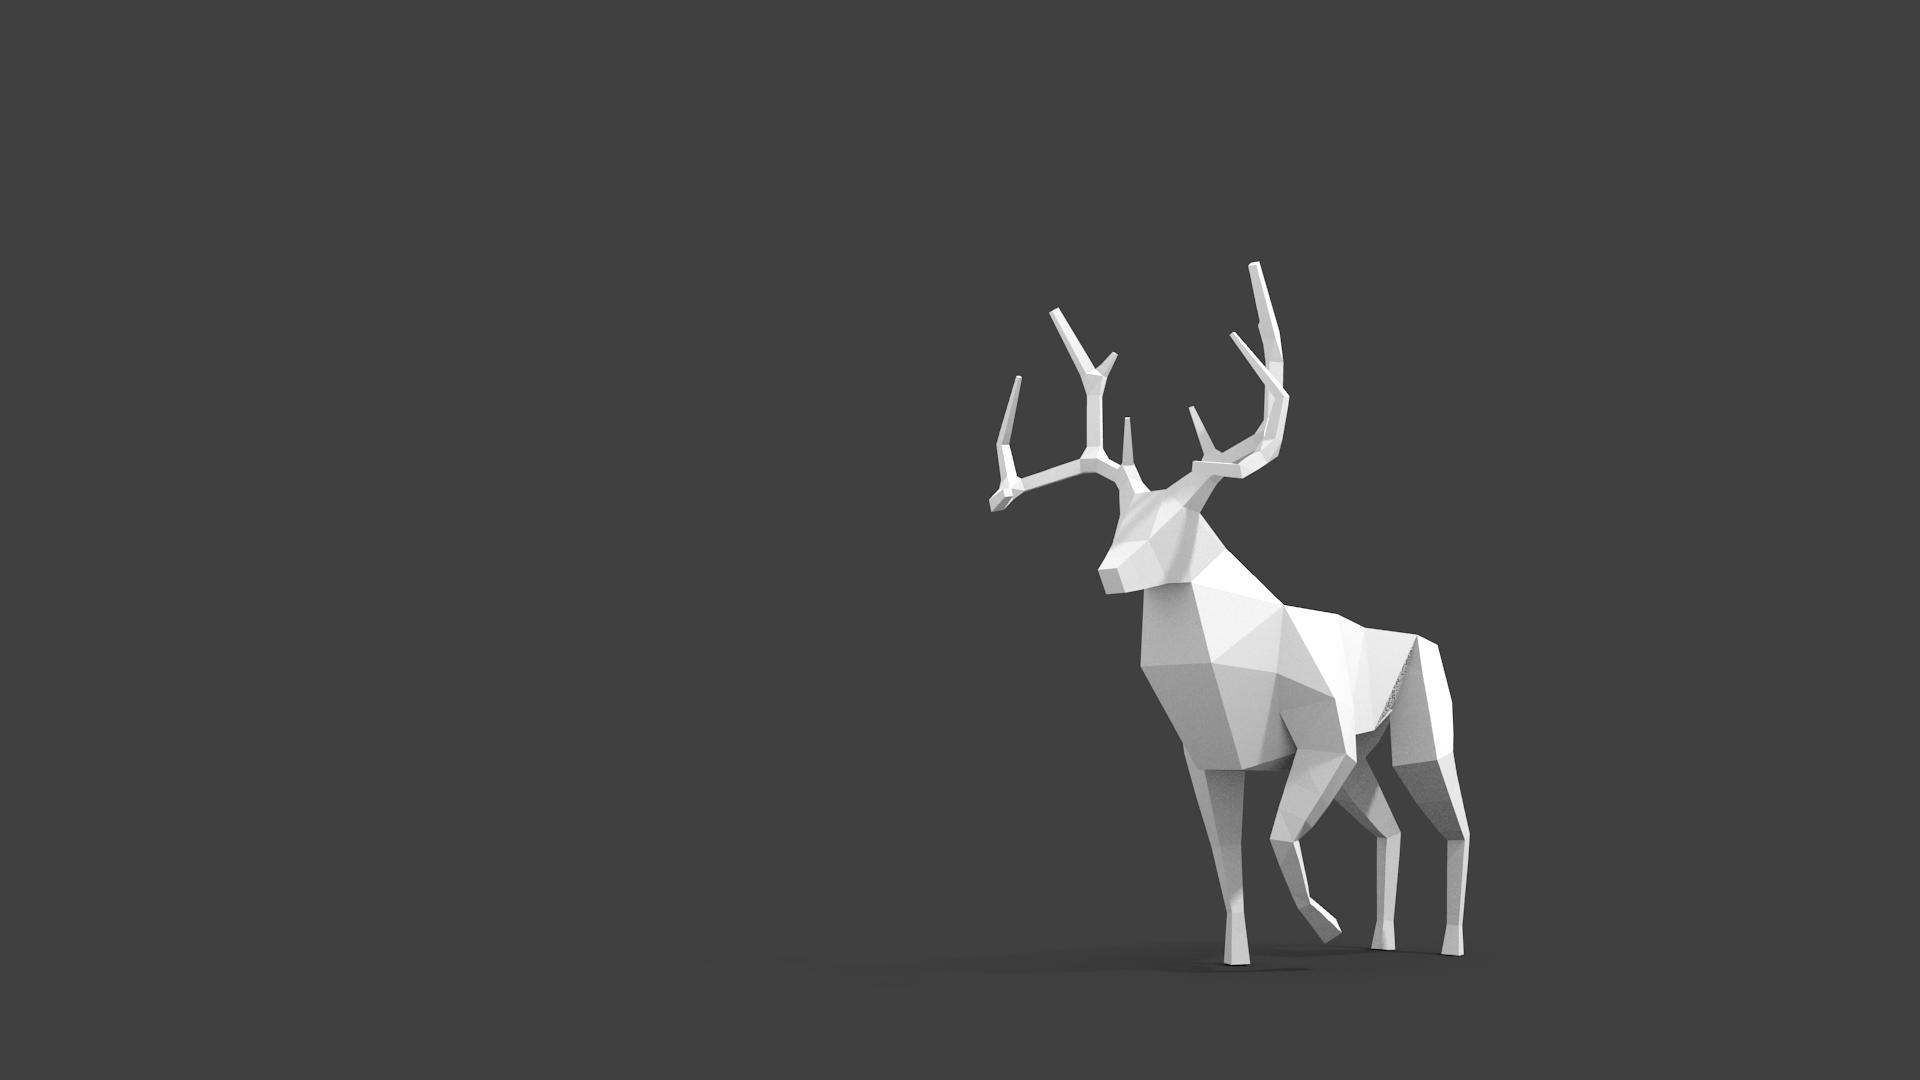 deer gray low poly - photo #14